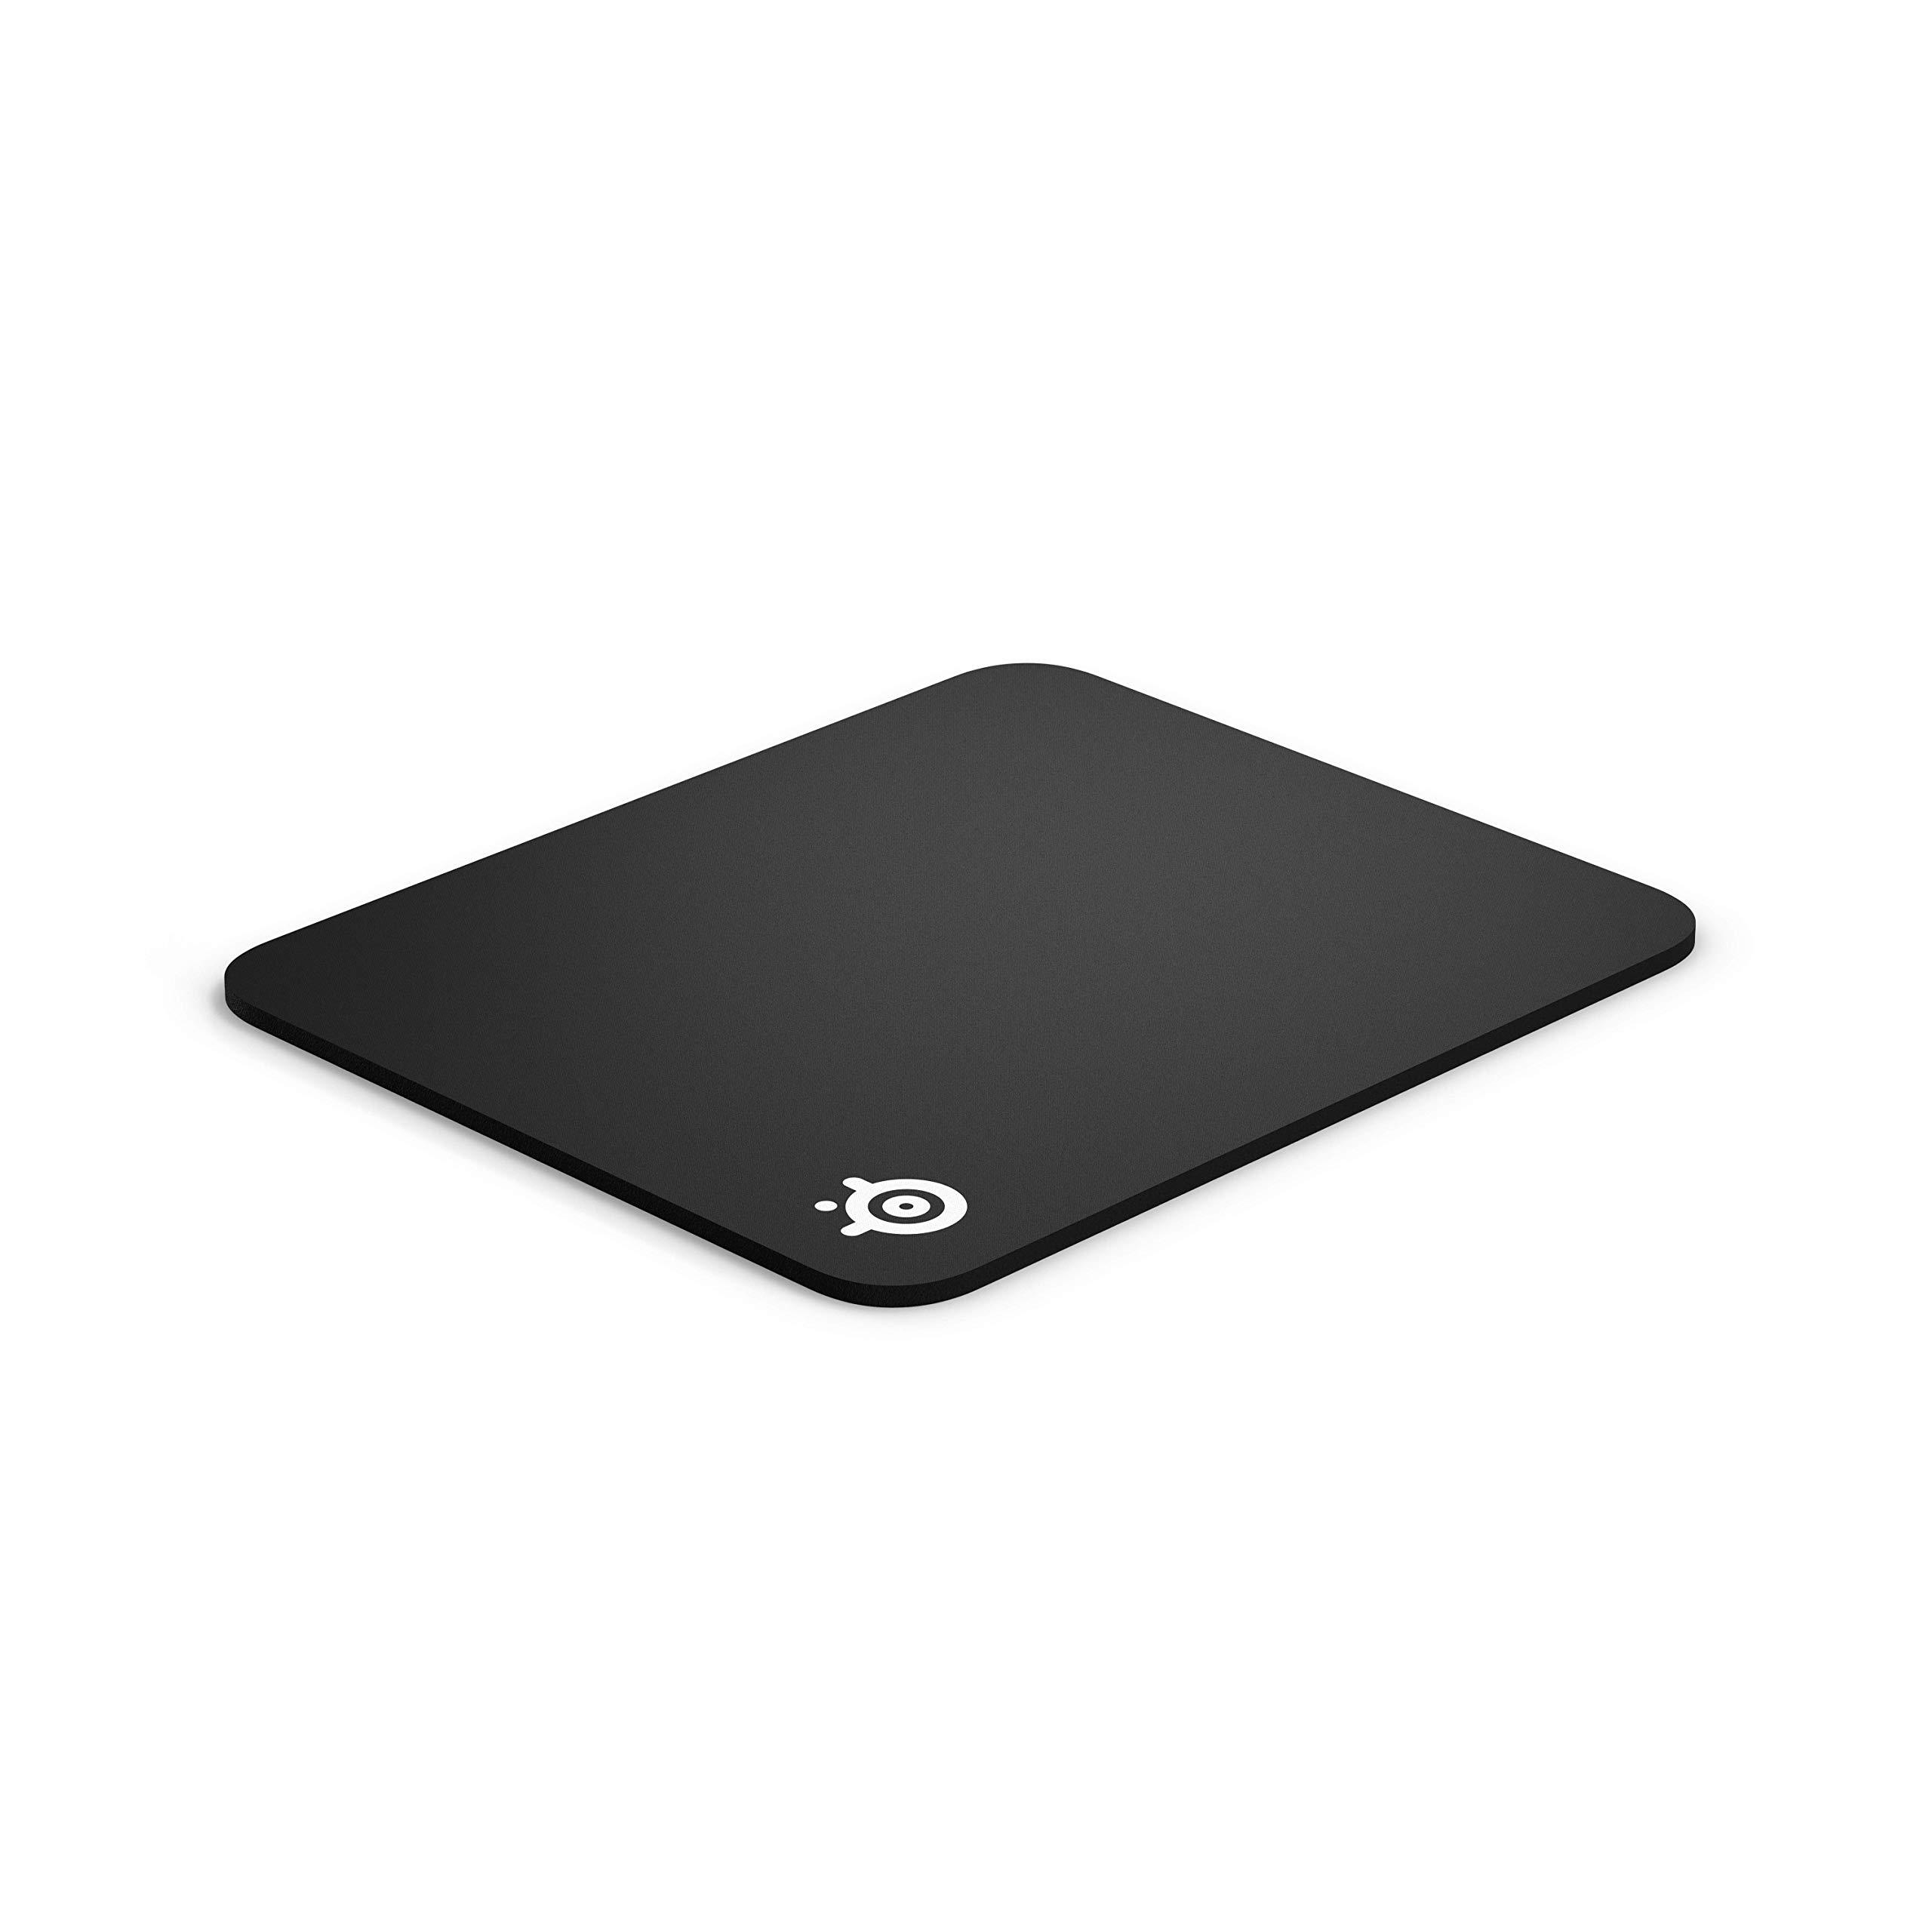 Mousepad Medium SteelSeries Qck Gaming Surface - Medium Thic